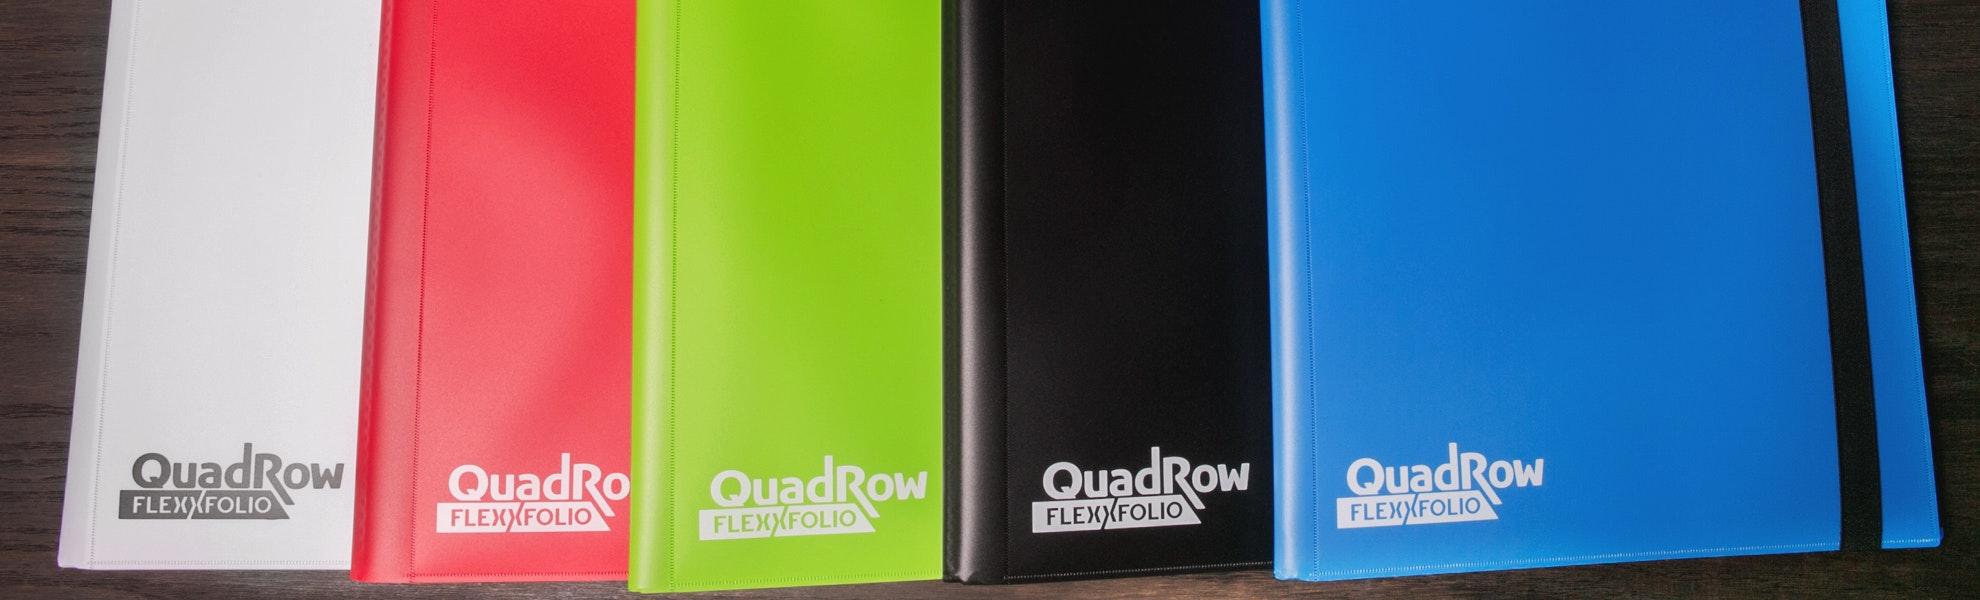 Ultimate Guard FlexxFolio Quadrow